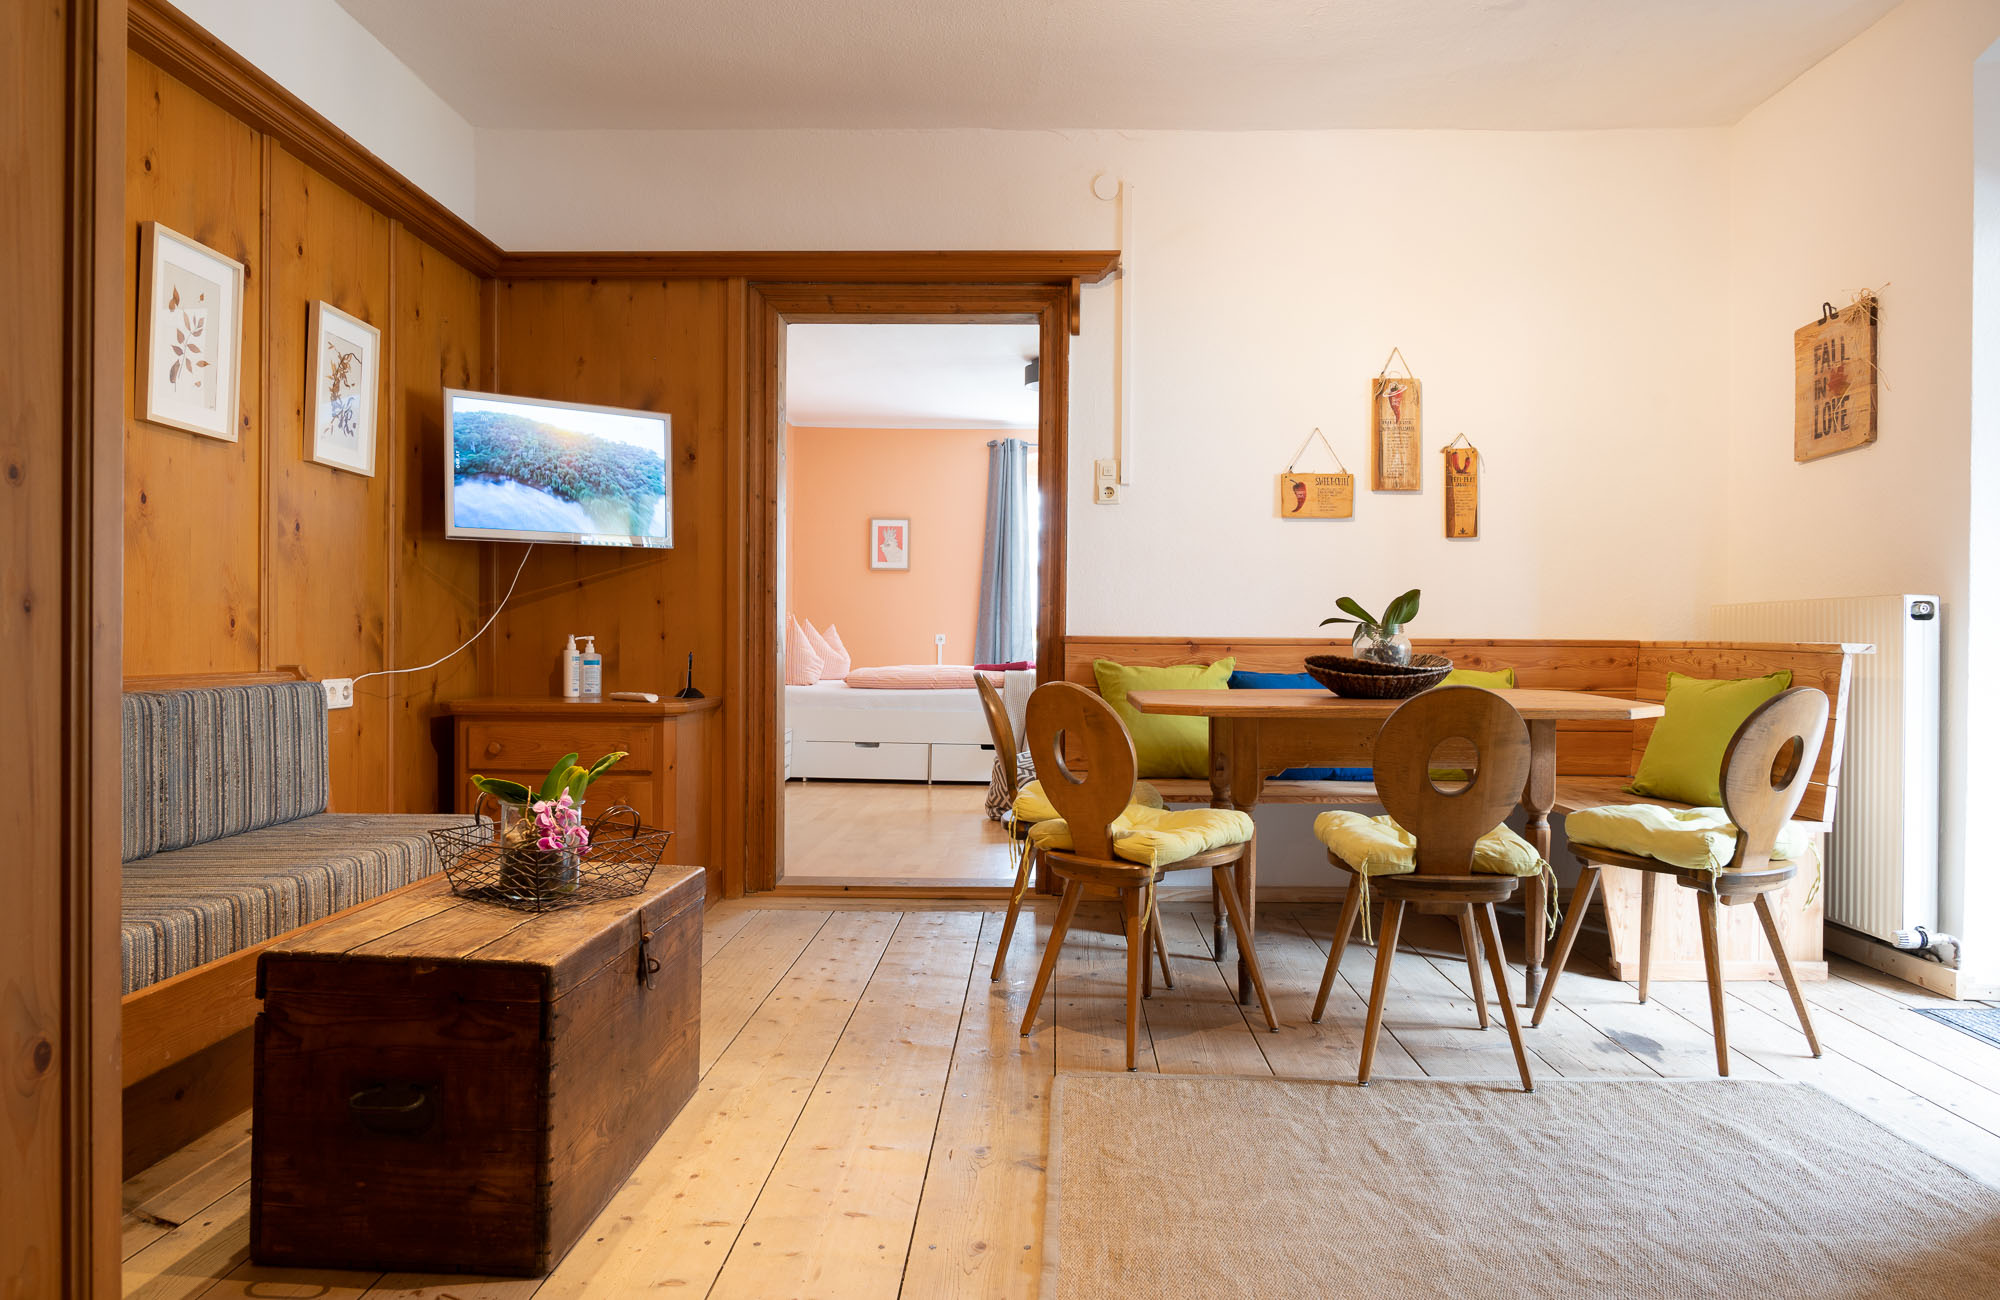 Absteige Innsbruck, Ferienapartment, Wohnküche